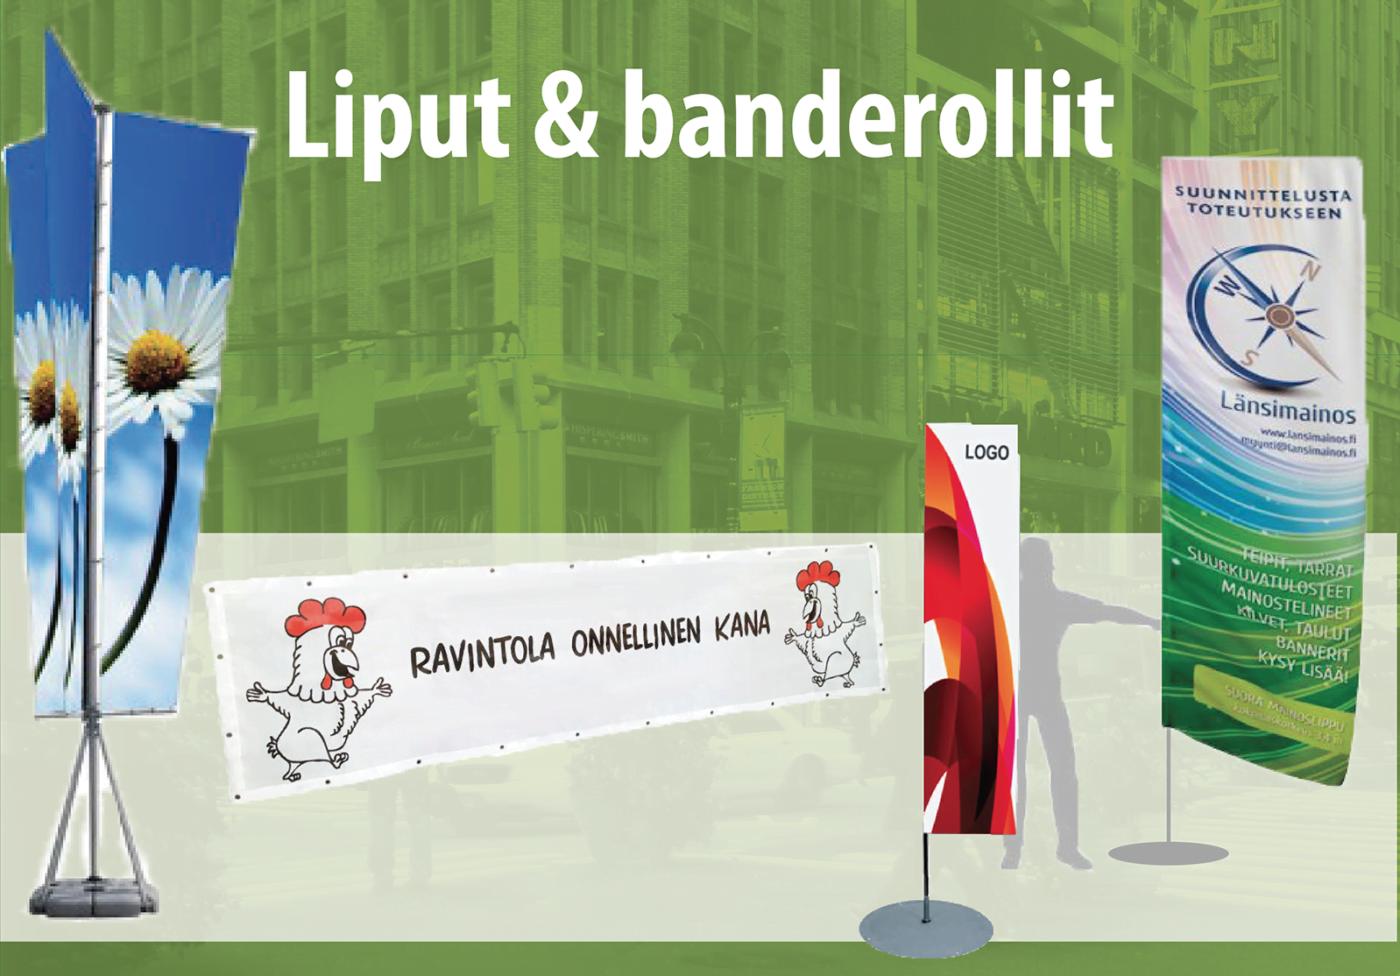 Liput & banderollit